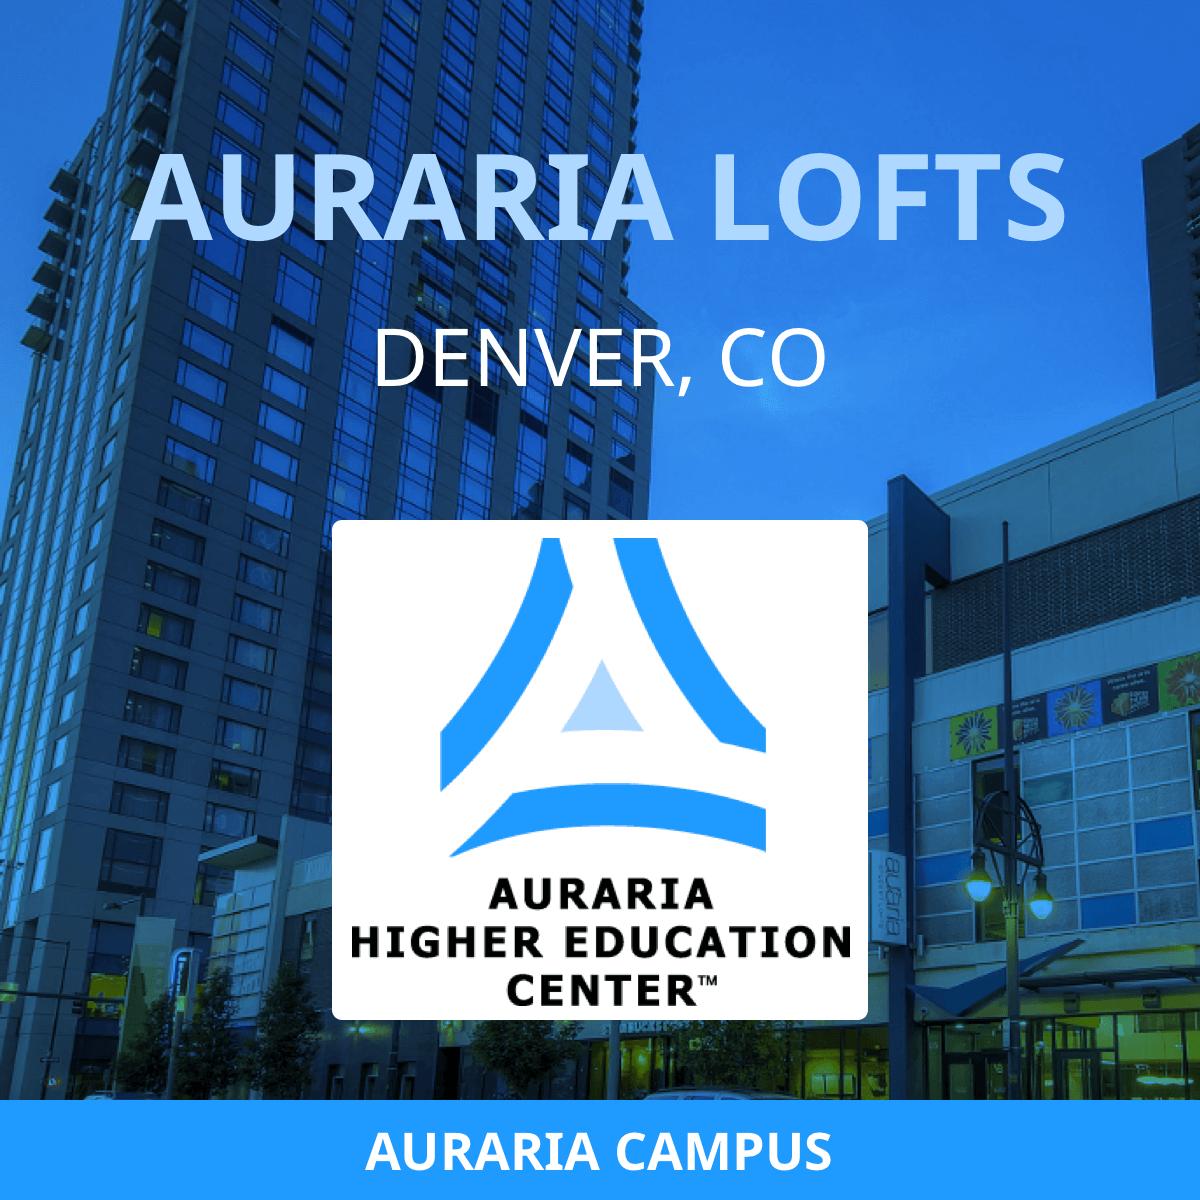 Apartments For Rent East Denver: Auraria Student Housing Apartments Near The Auraria